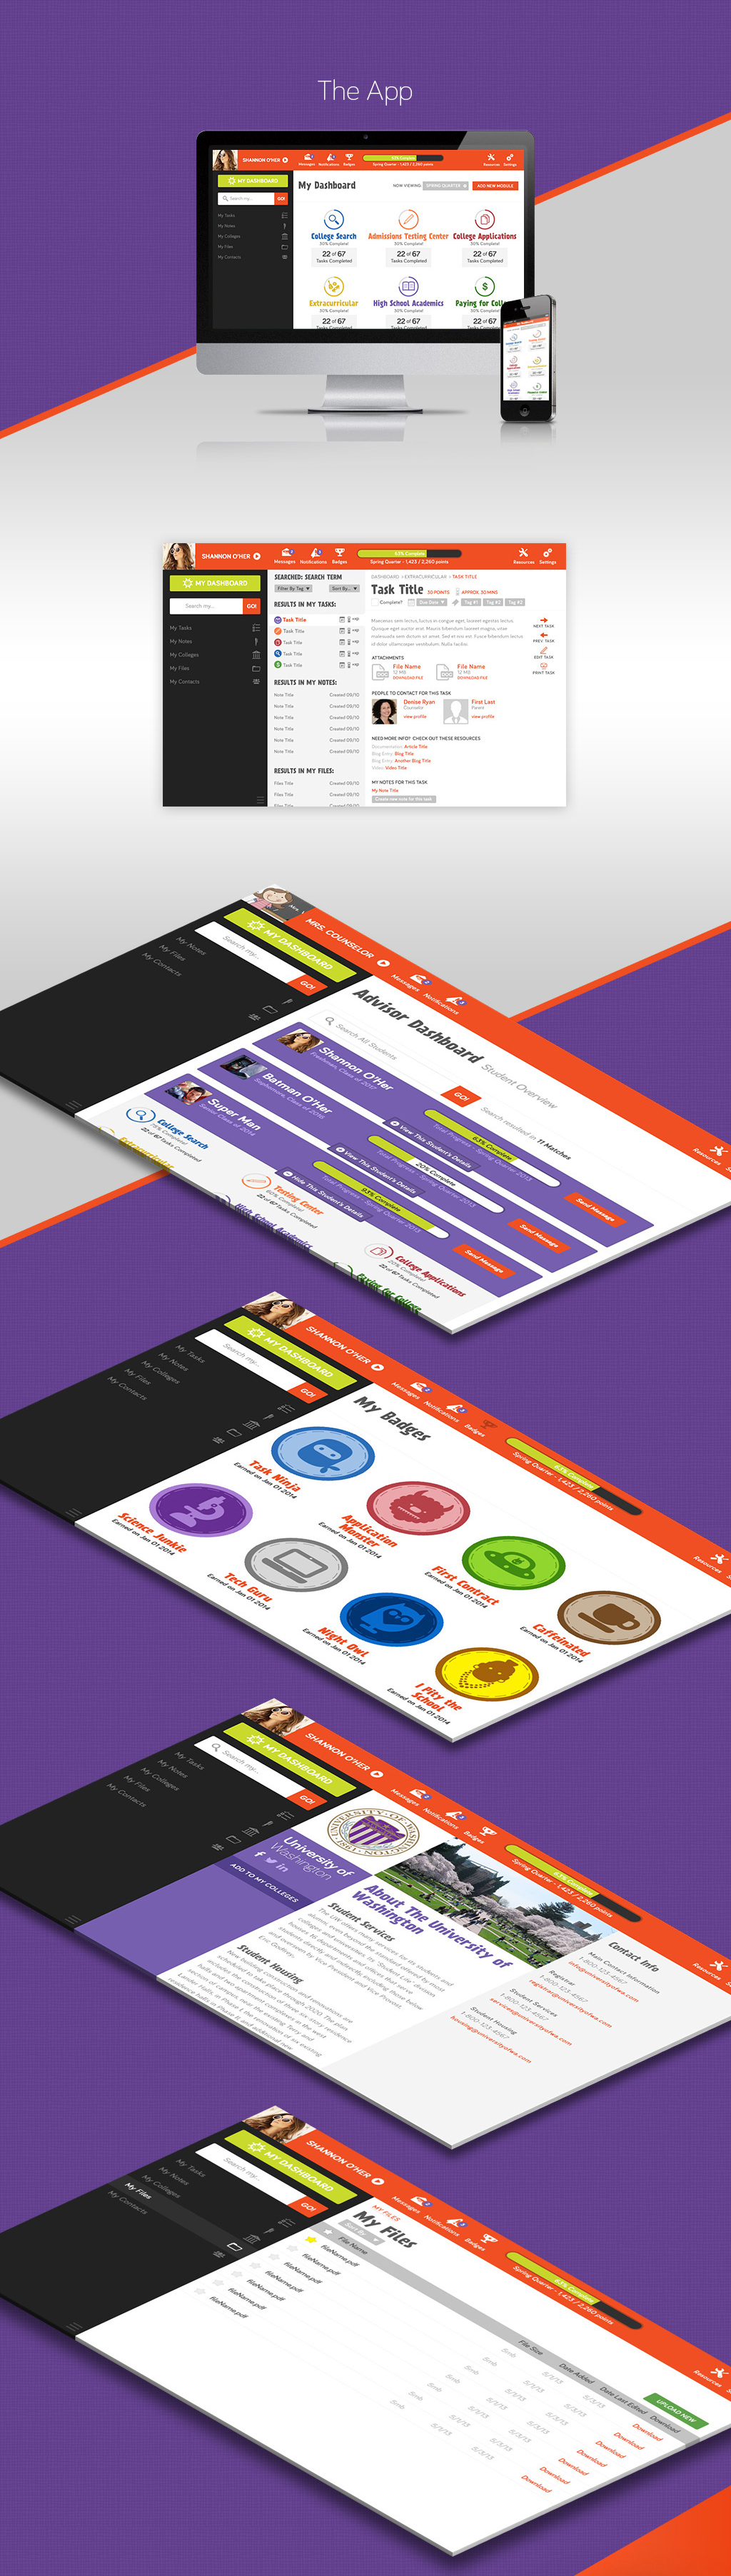 Frosh Monster App Screens